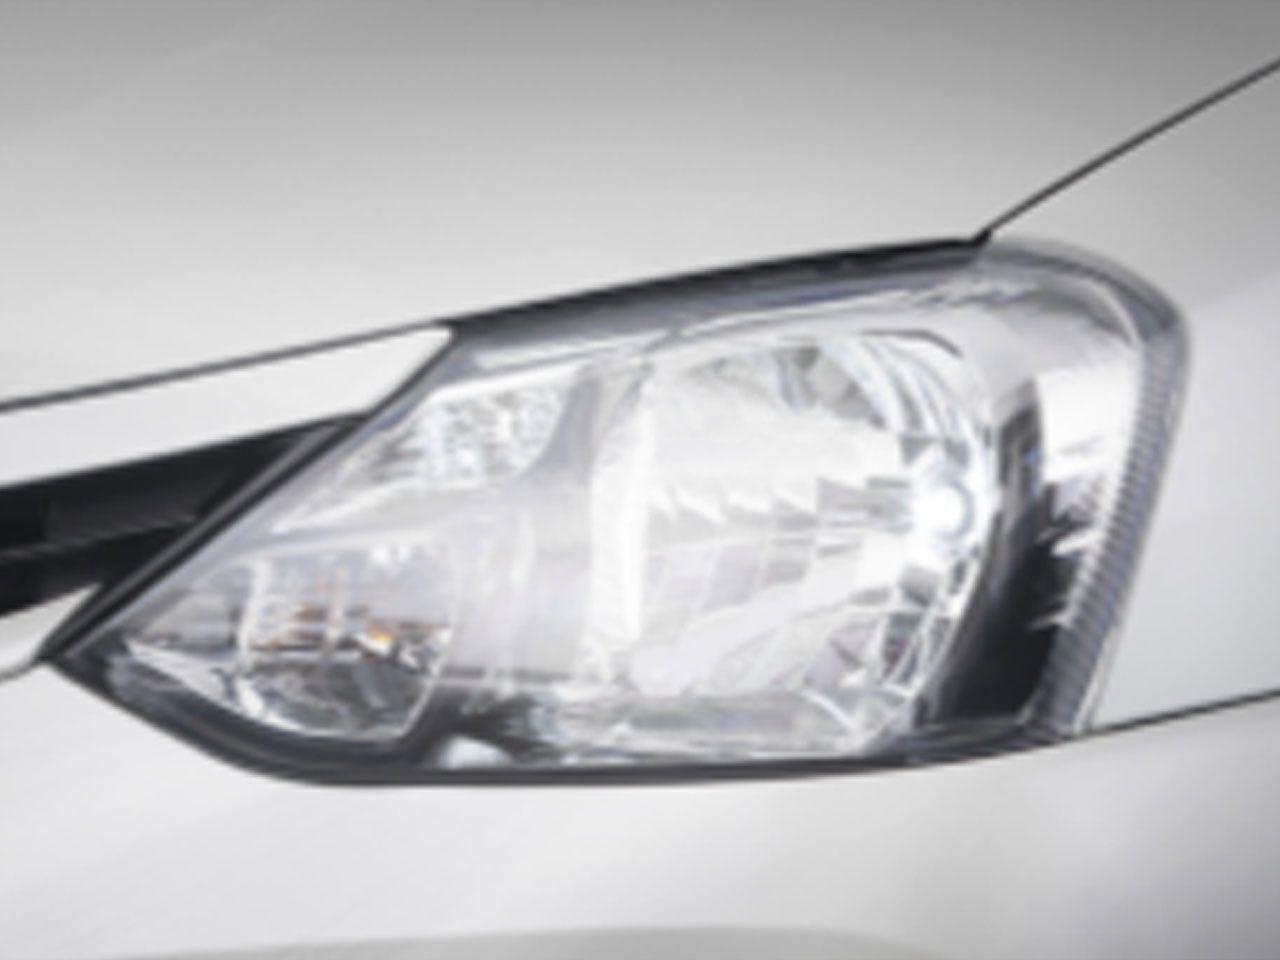 Kit de Lâmpadas de Luz Branca para Faróis e Lanternas Etios Sedã X  - Mirai Peças Toyota